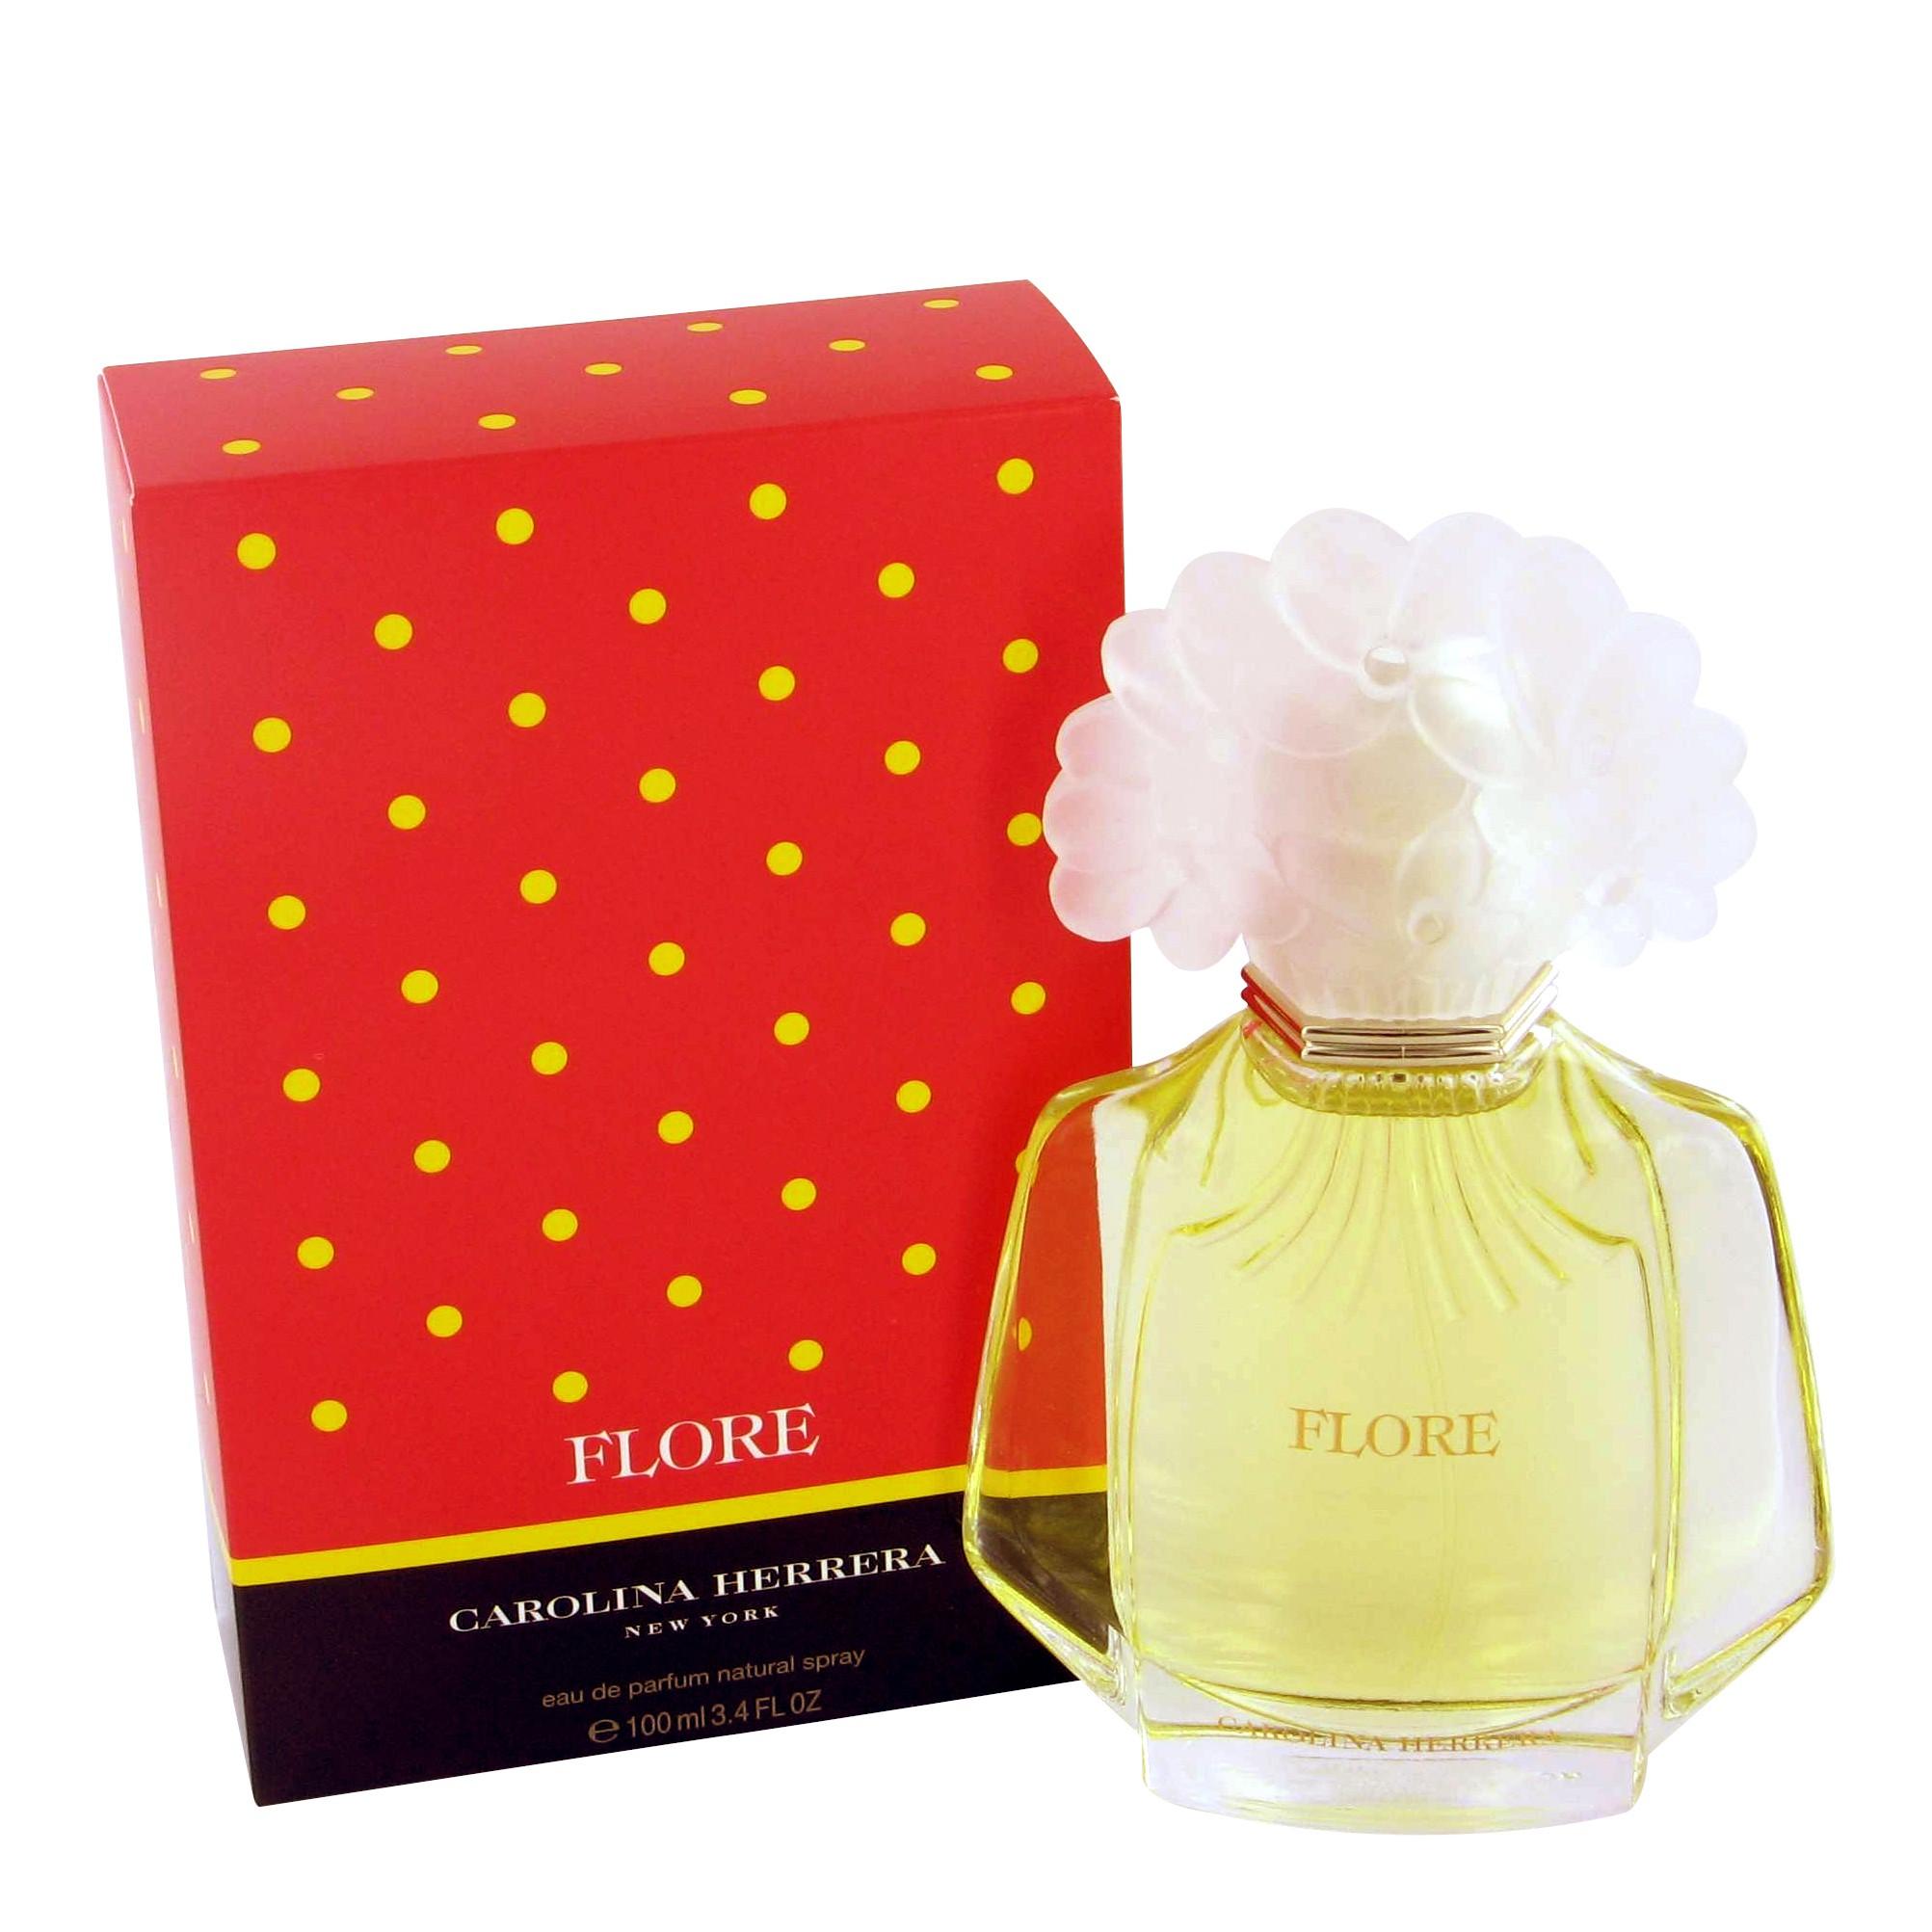 Carolina Herrera Flore аромат для женщин